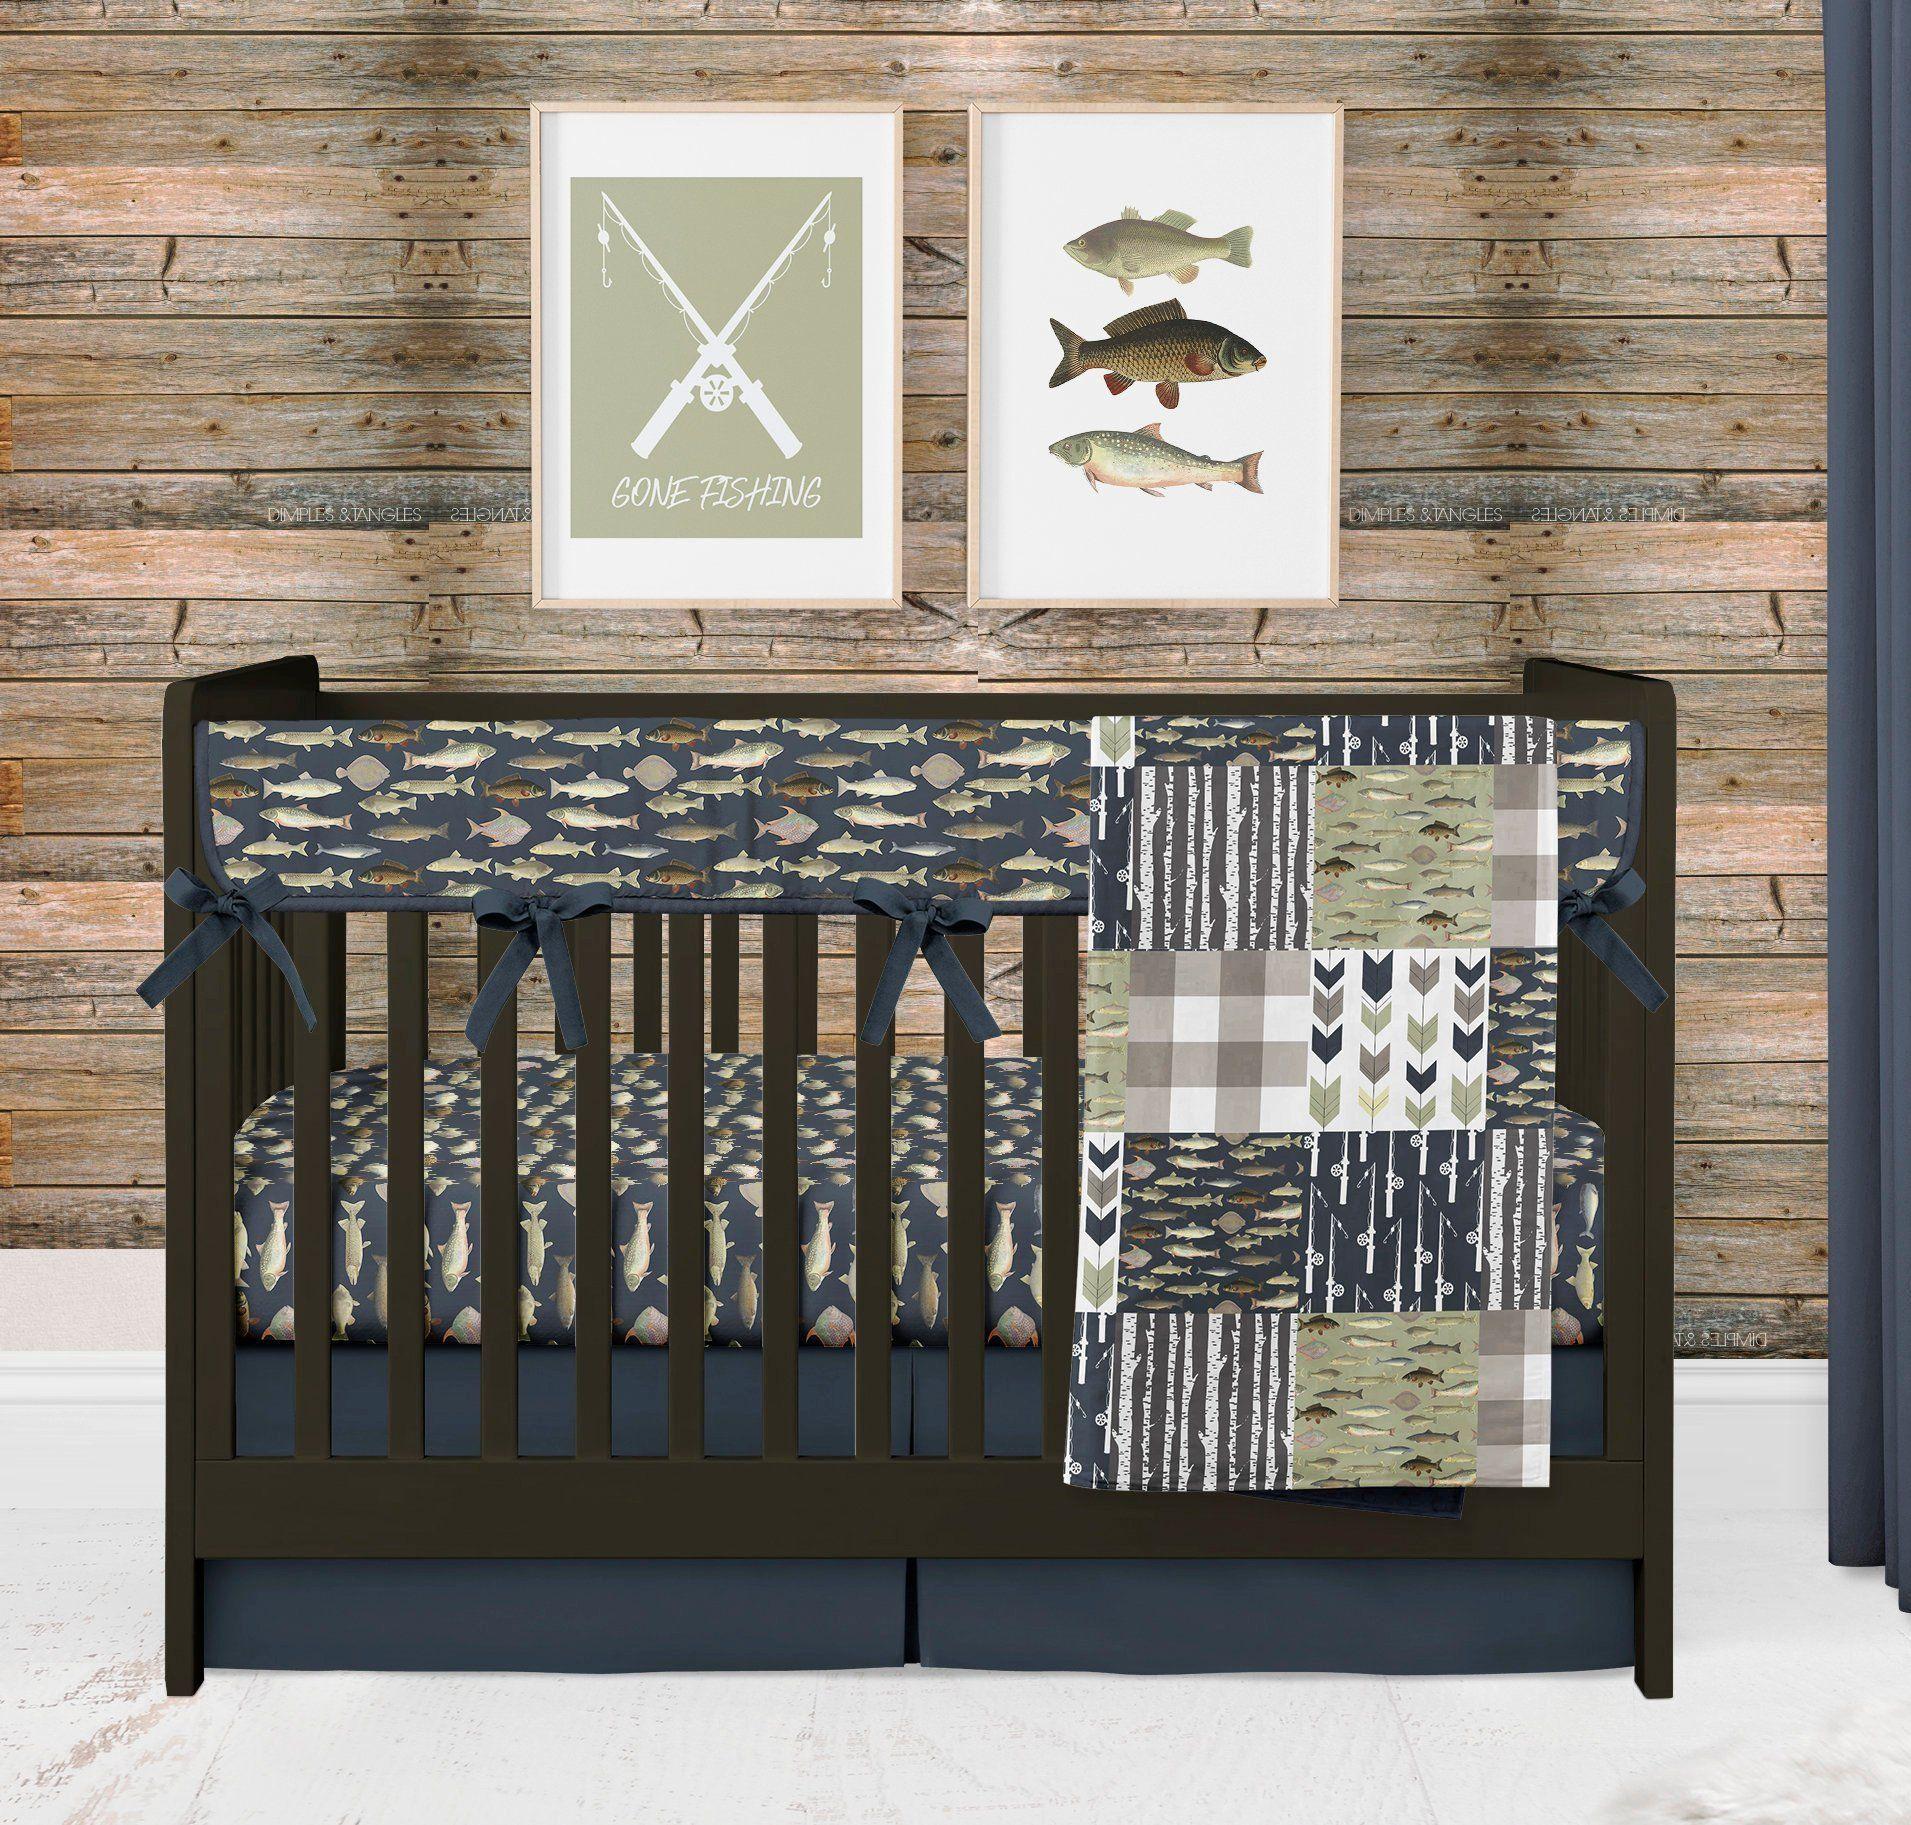 Fishing Crib Bedding Set for Baby Boy Nursery, Woodland Outdoor Gone Fishing Nursery Theme